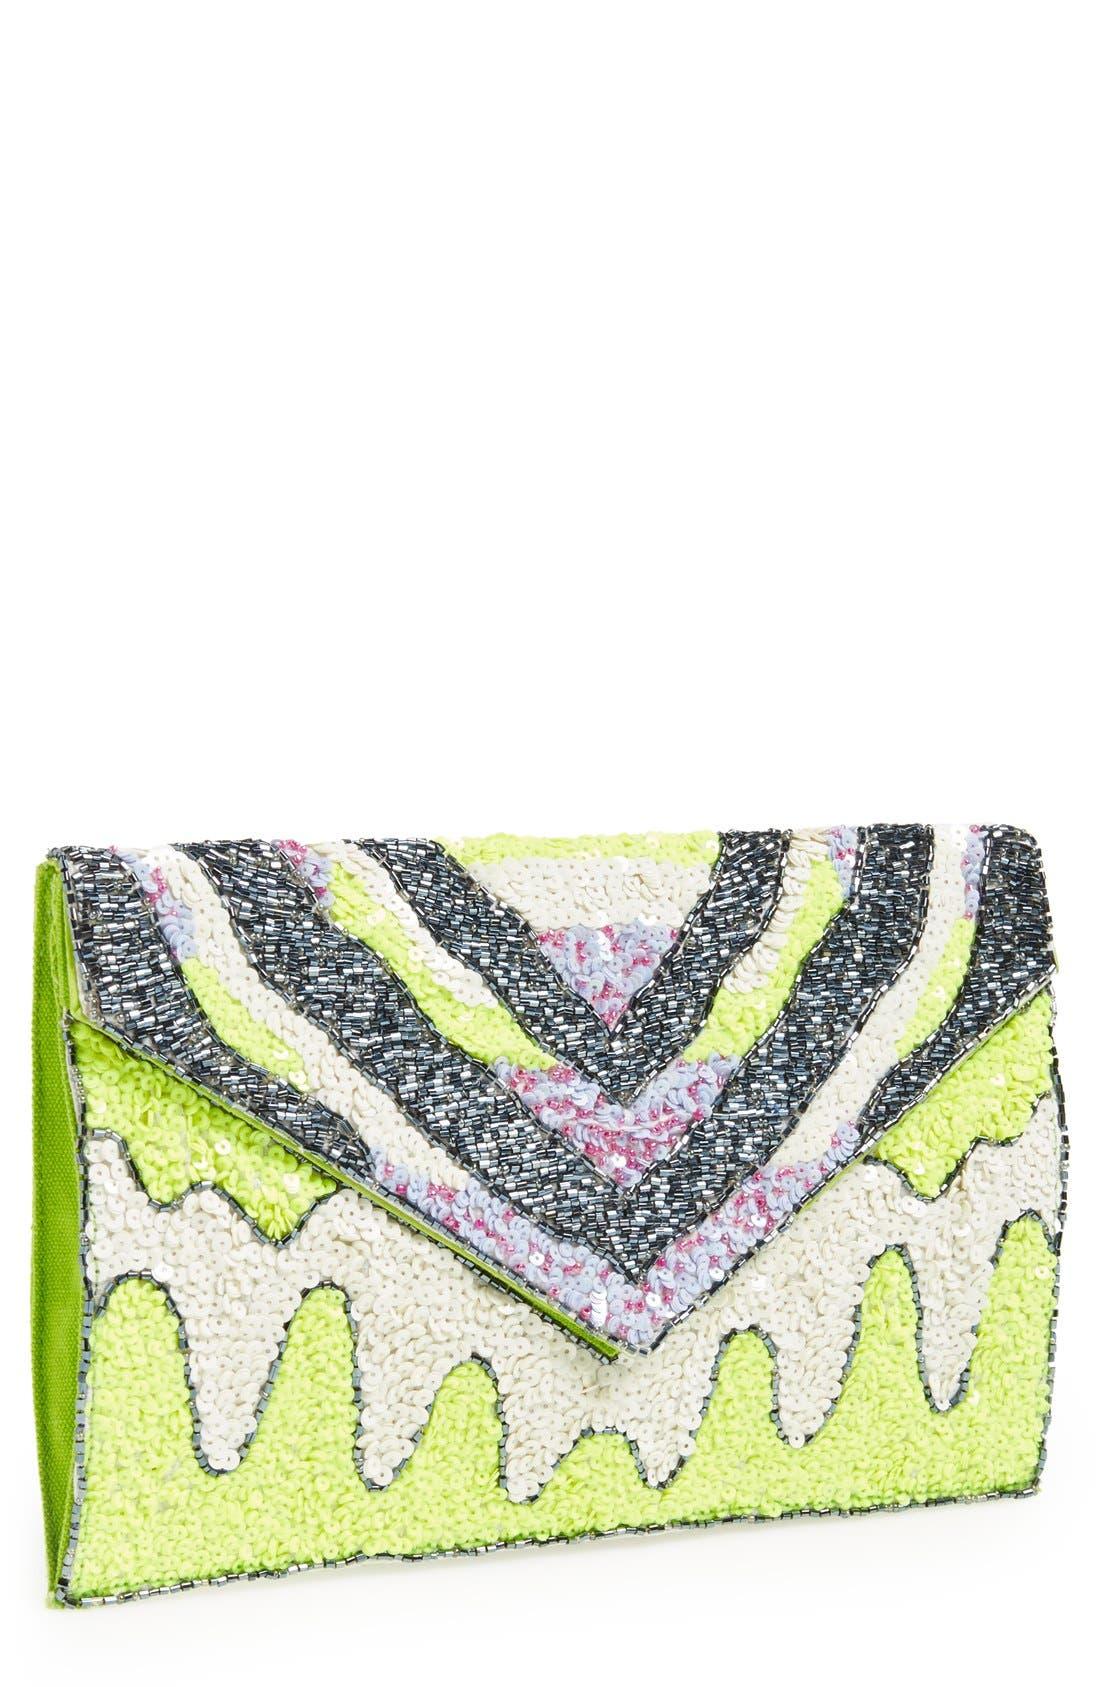 Alternate Image 1 Selected - Nila Anthony Beaded Envelope Clutch